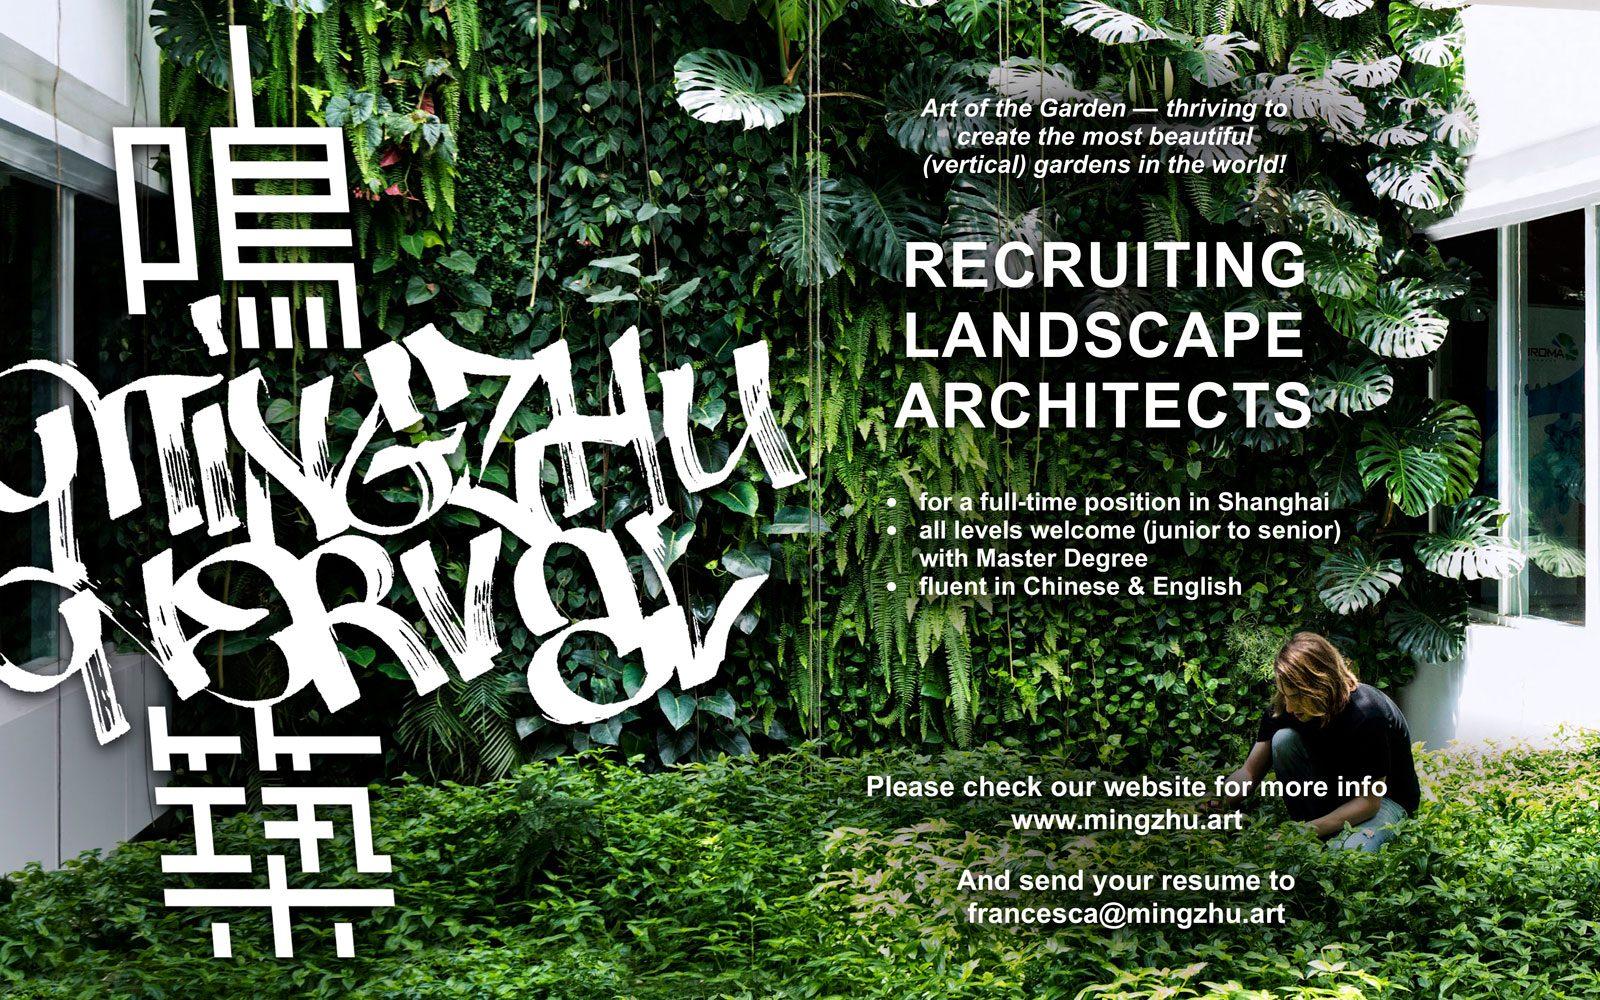 Mingzhu Nerval recruitment announcement for landscape architects